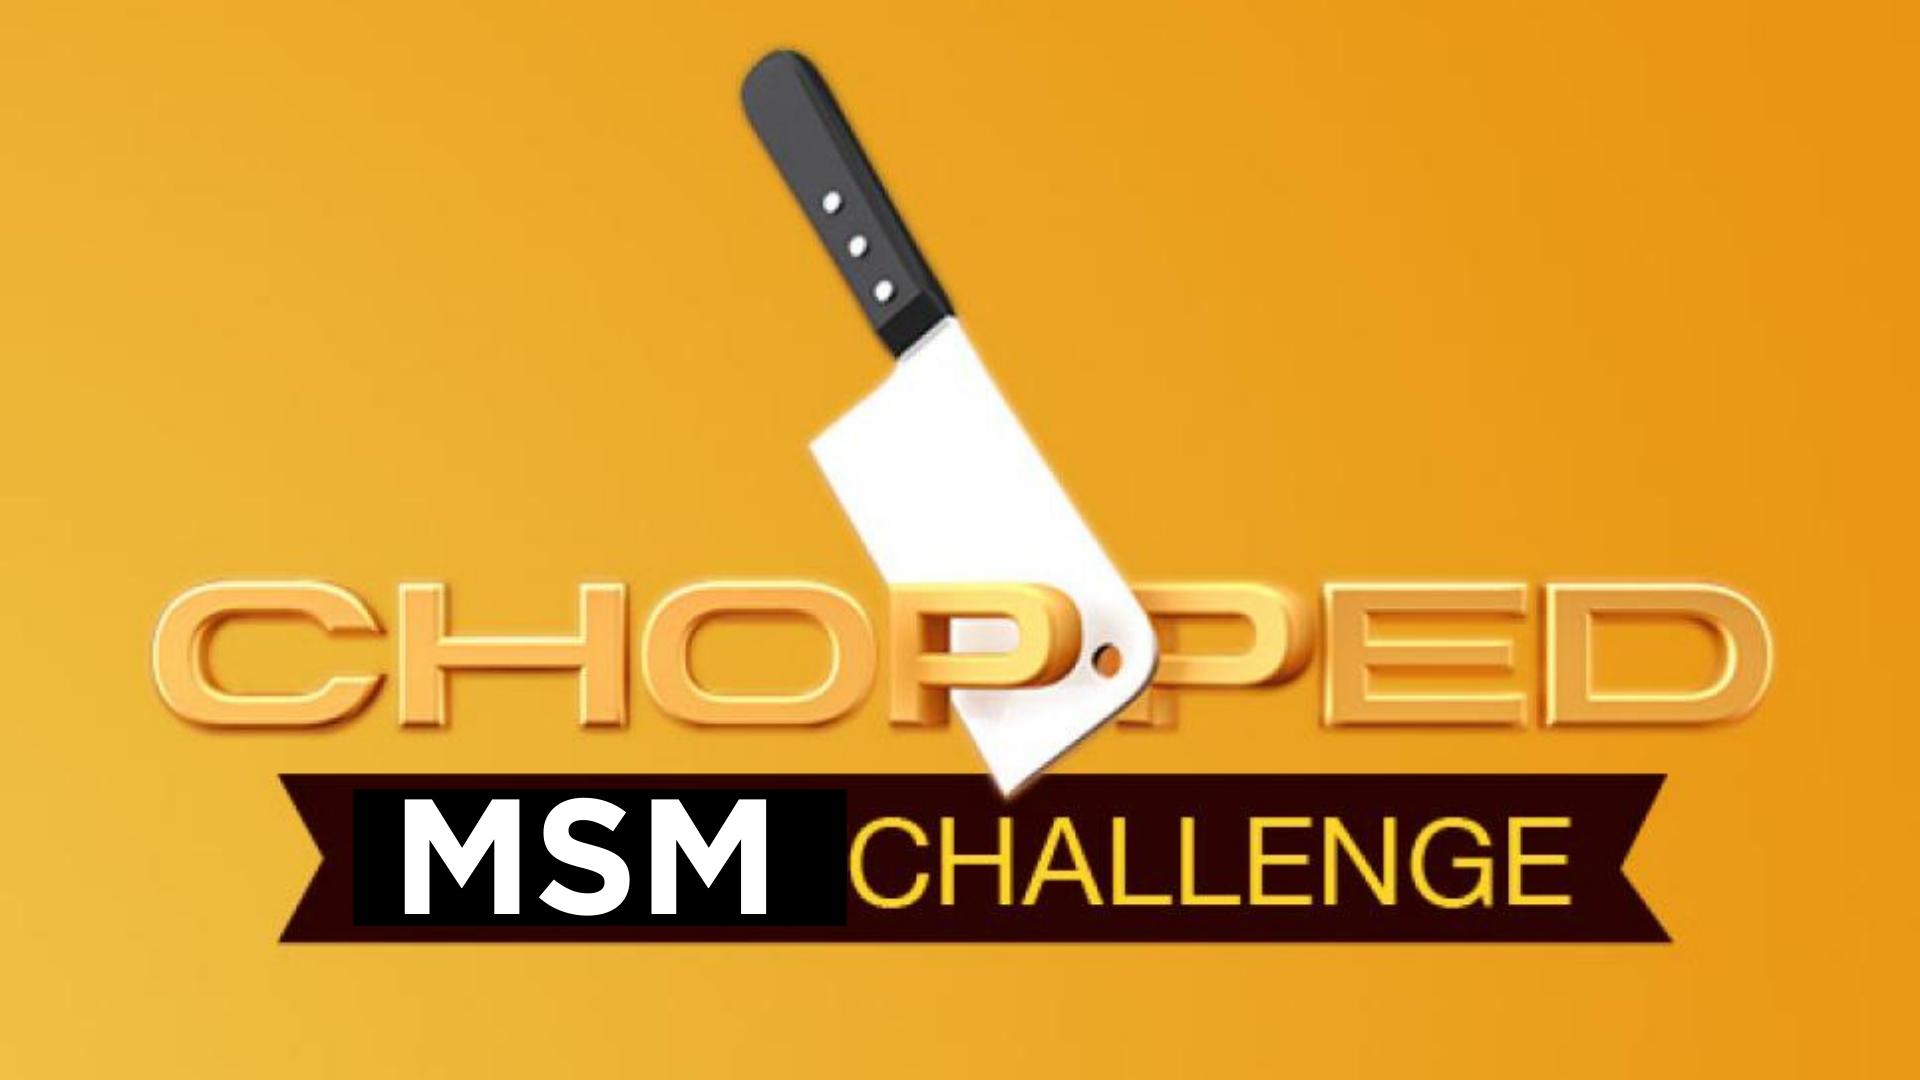 MSM Chopped Challenge